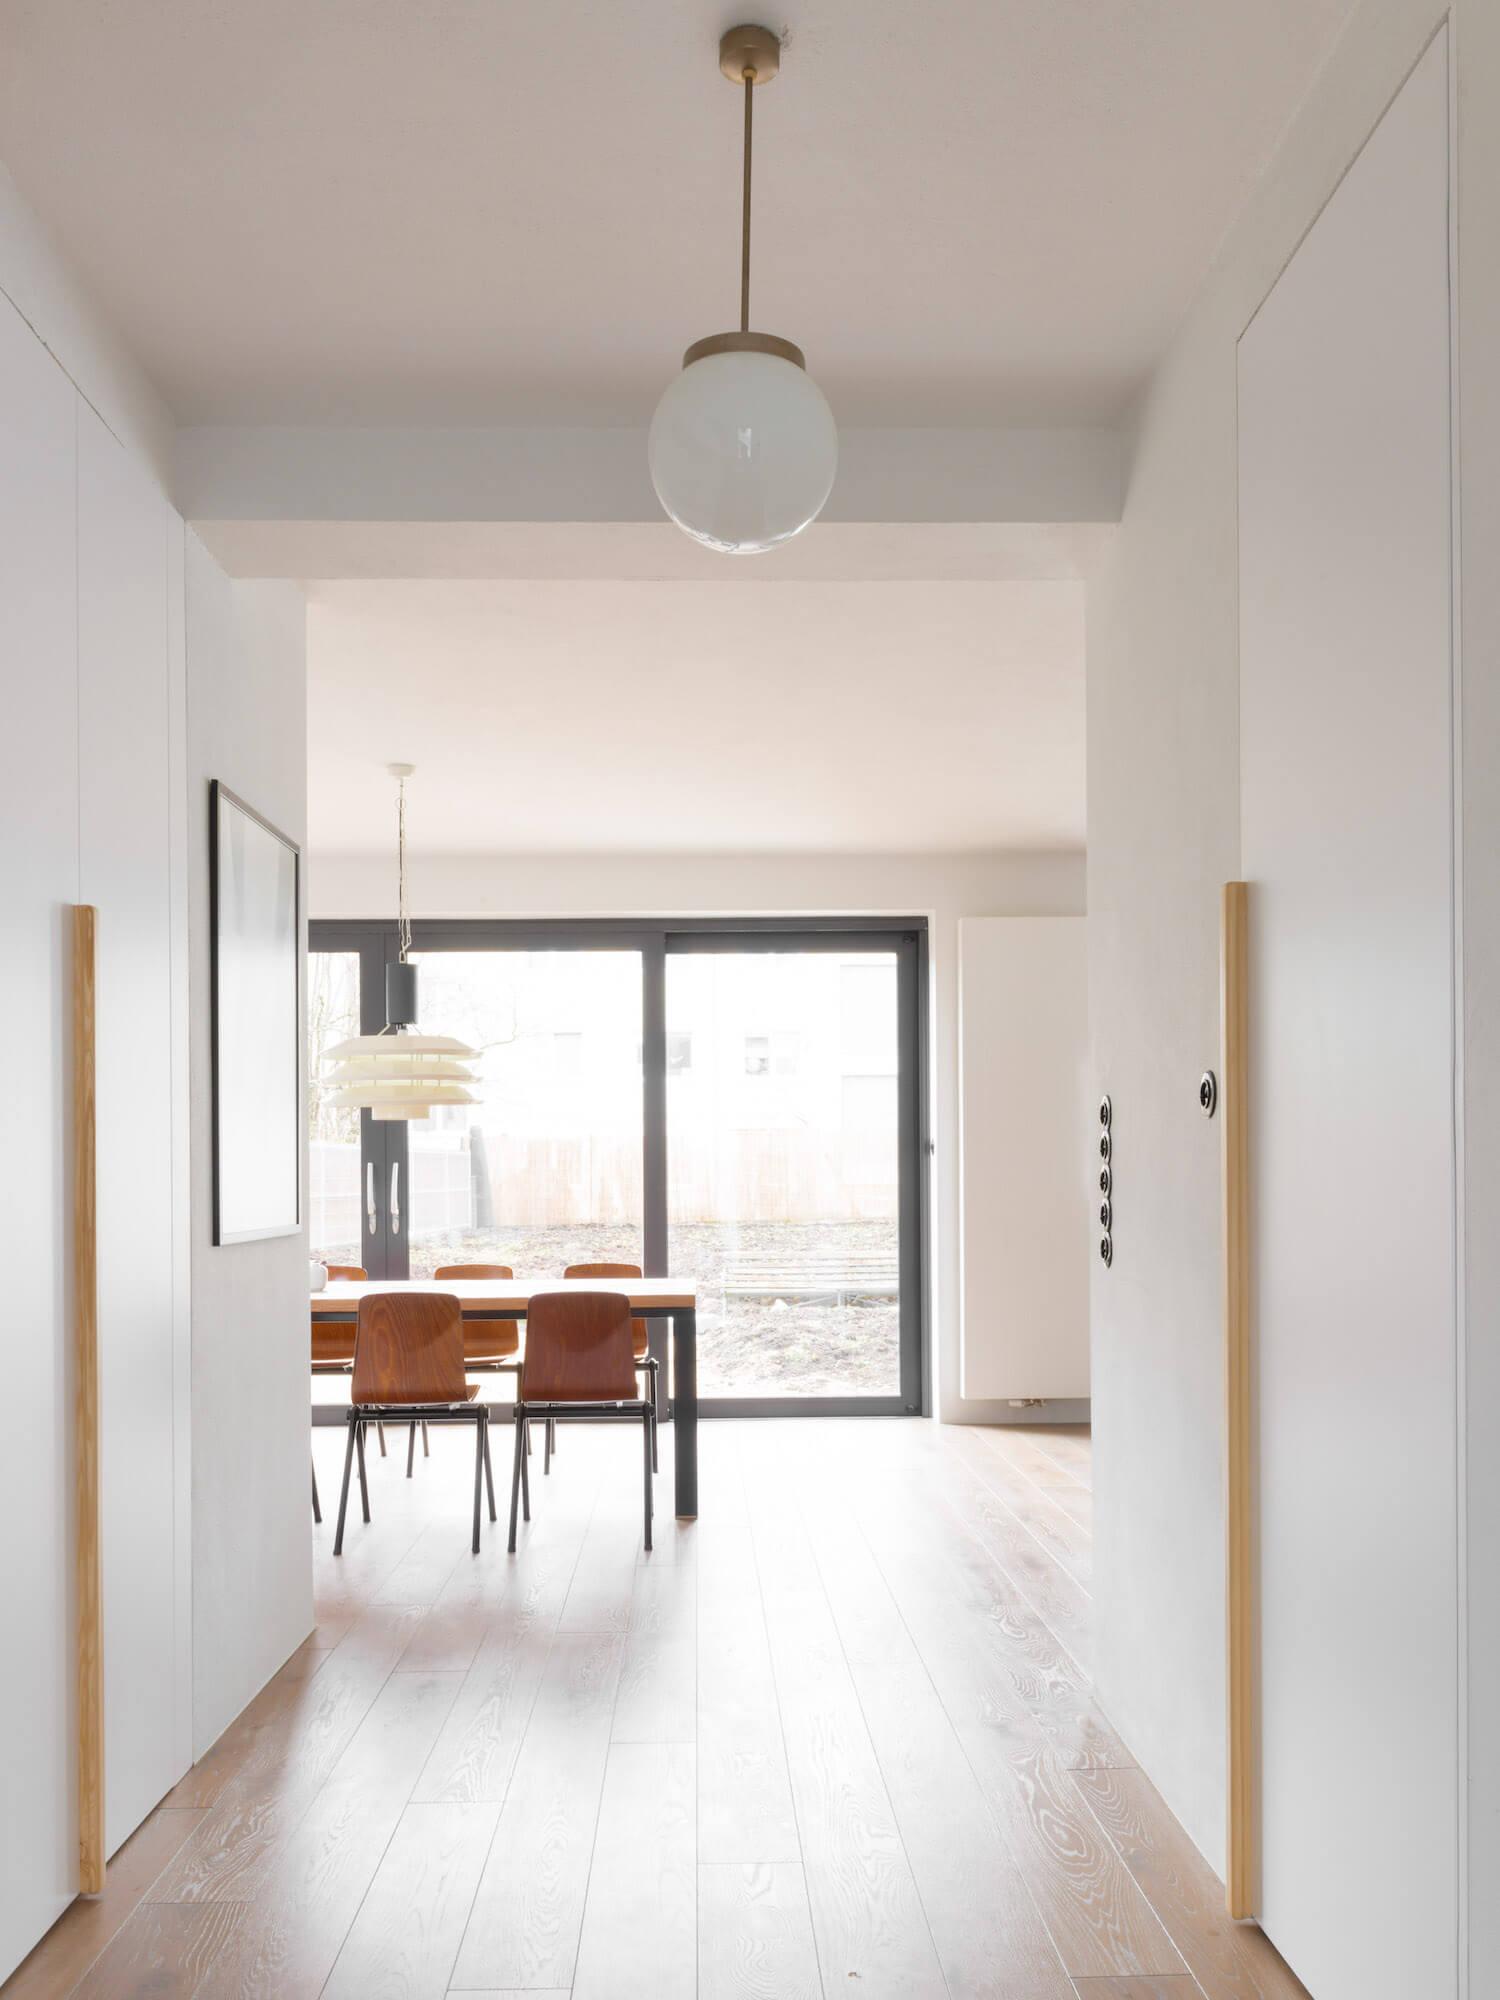 est living house by the park loft kolasinski 10